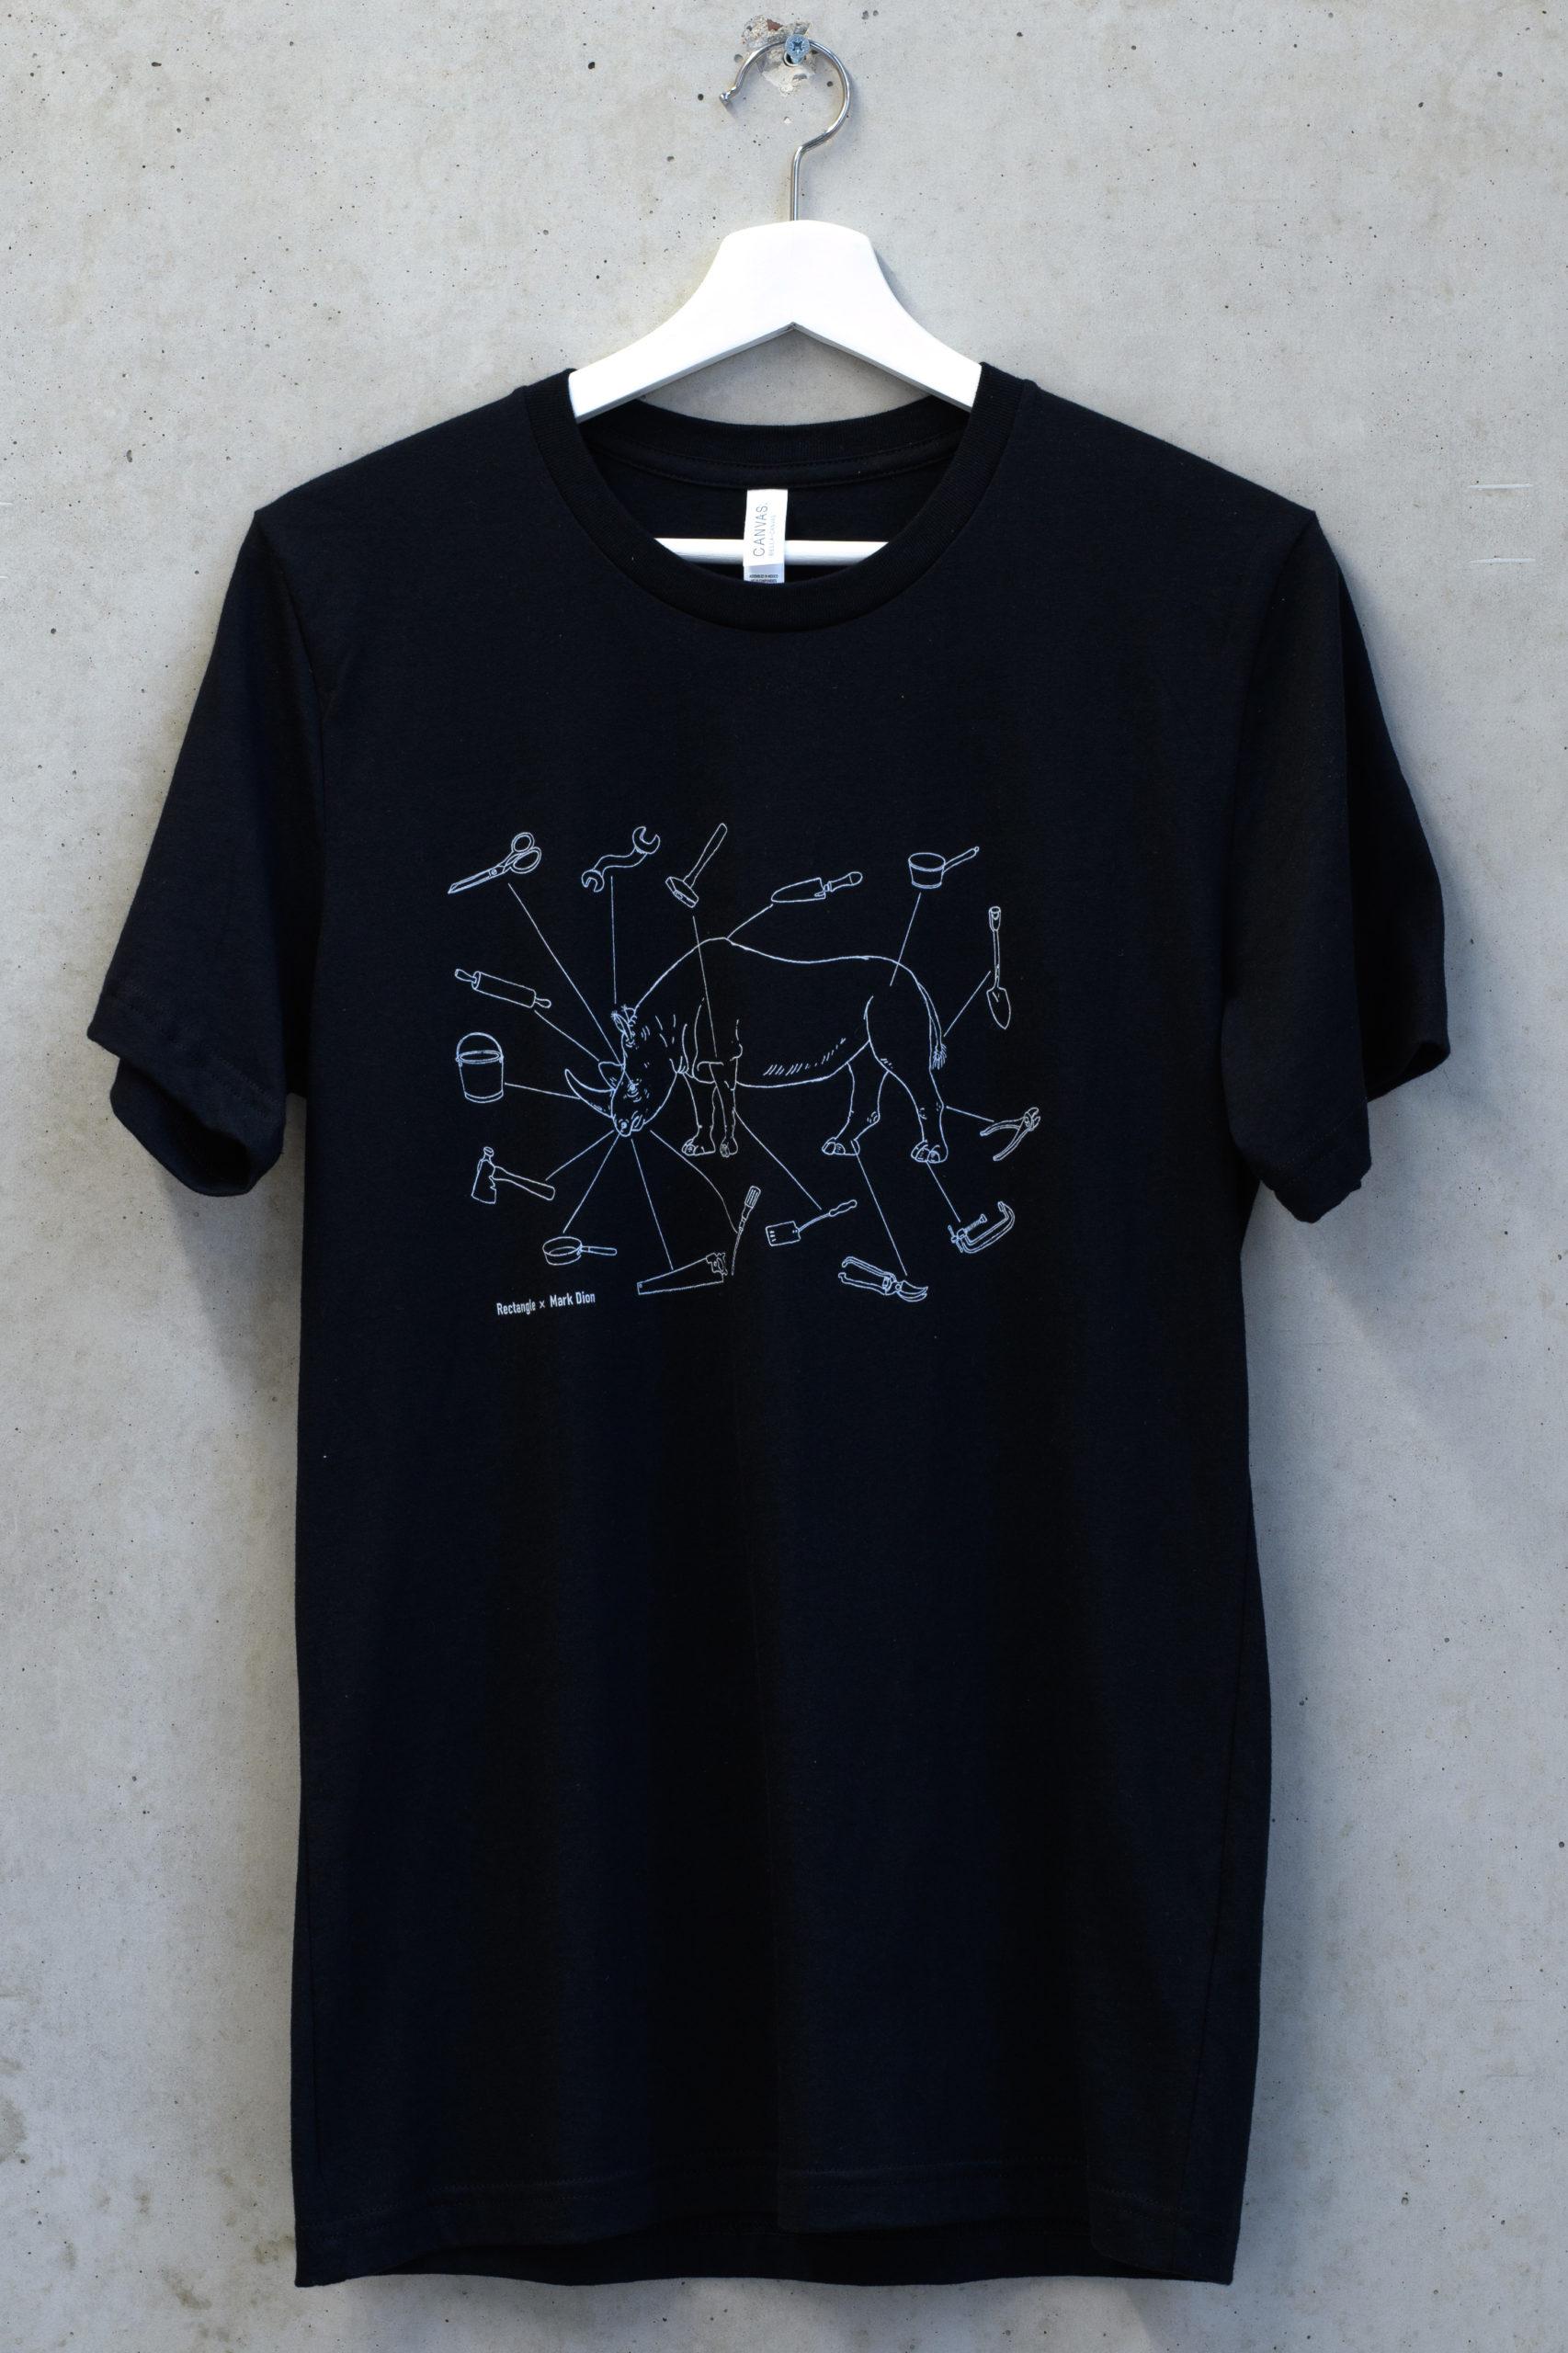 Mark Dion, Albeid Adelt, T-shirt, 2020 / 29 Euro